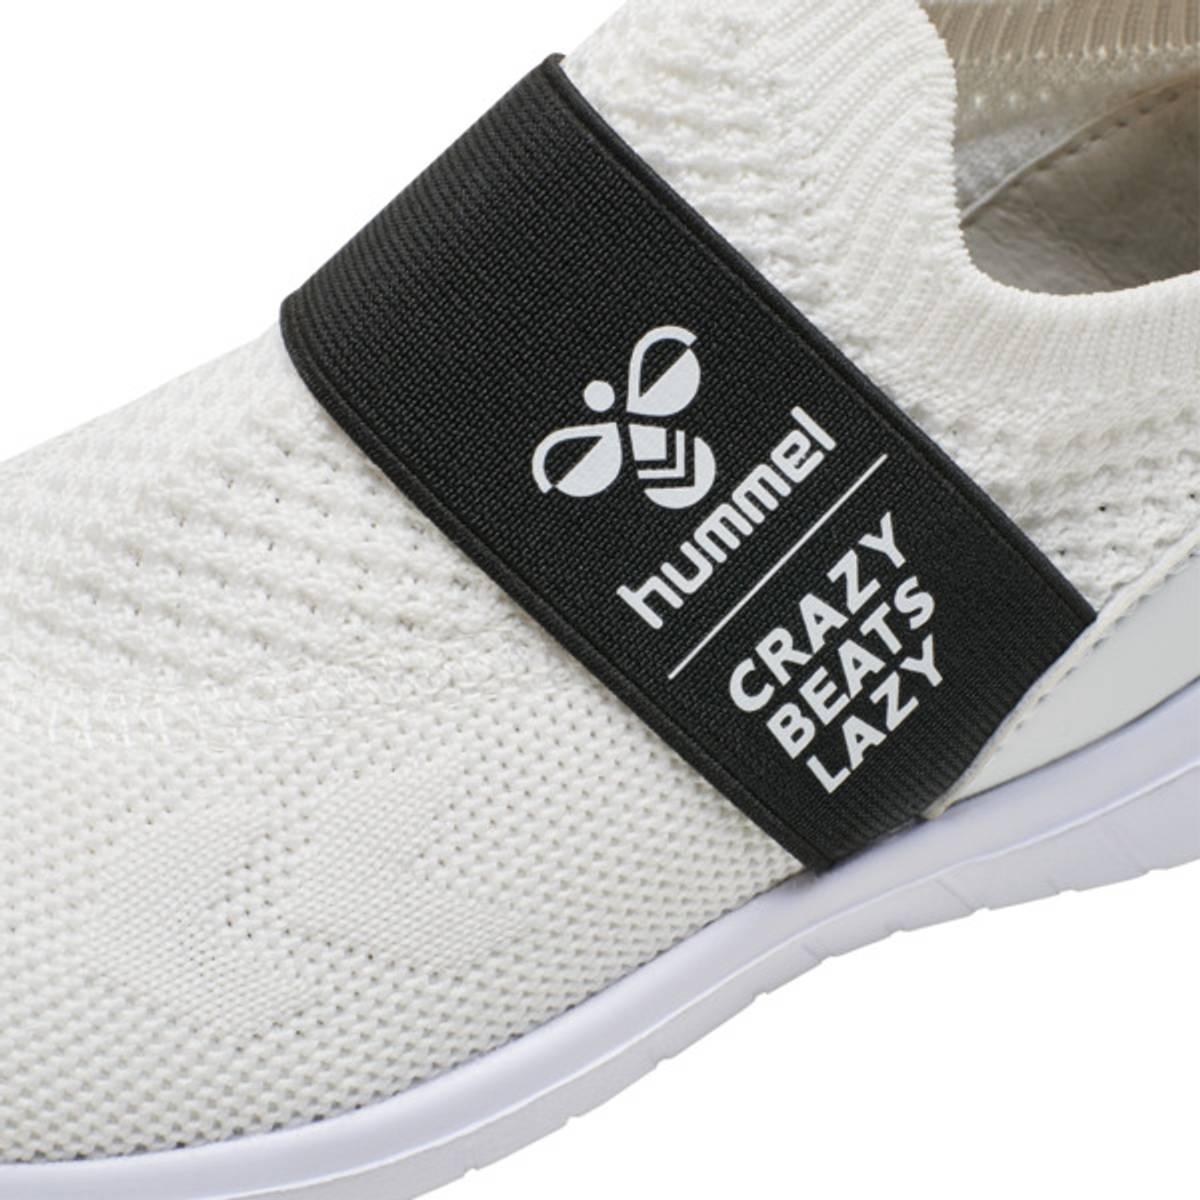 Hvit Hummel Slip-On Recycle Sko